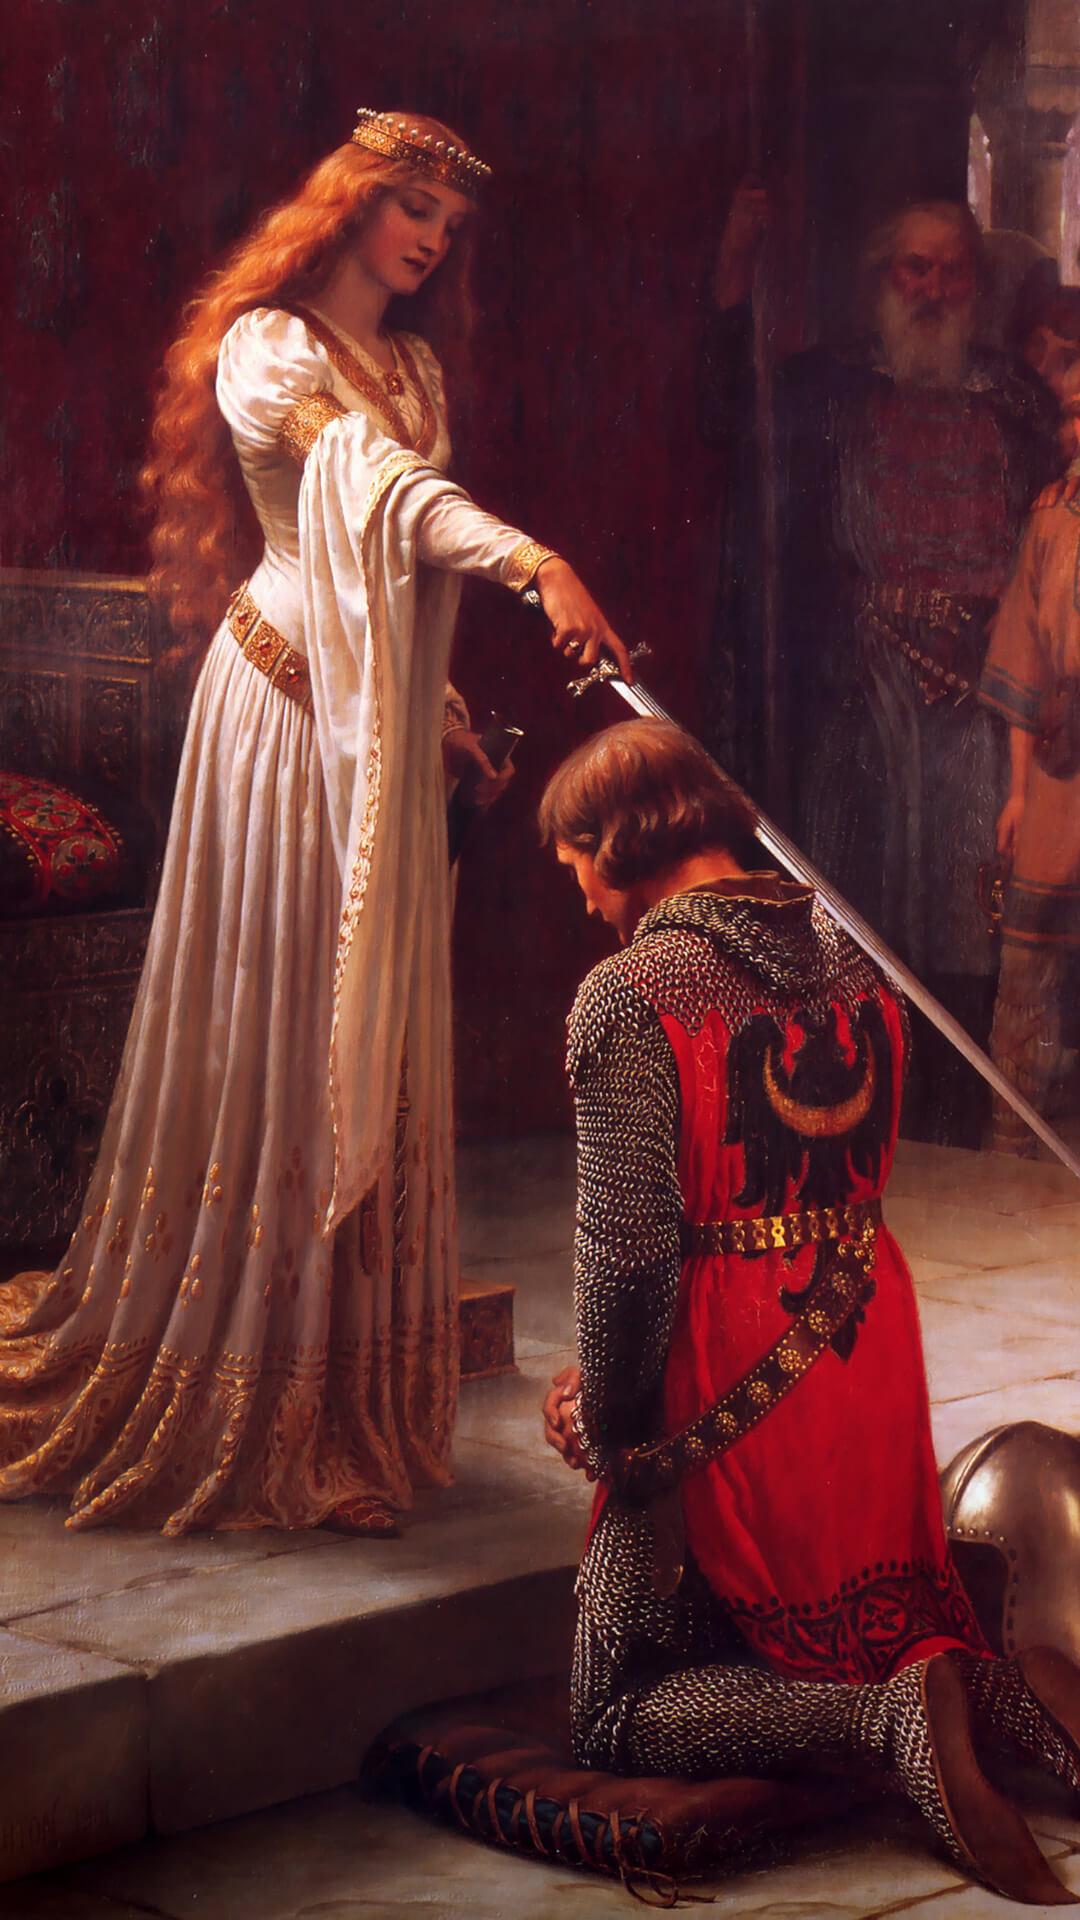 Edmund blair leighton accolade_1080x1920